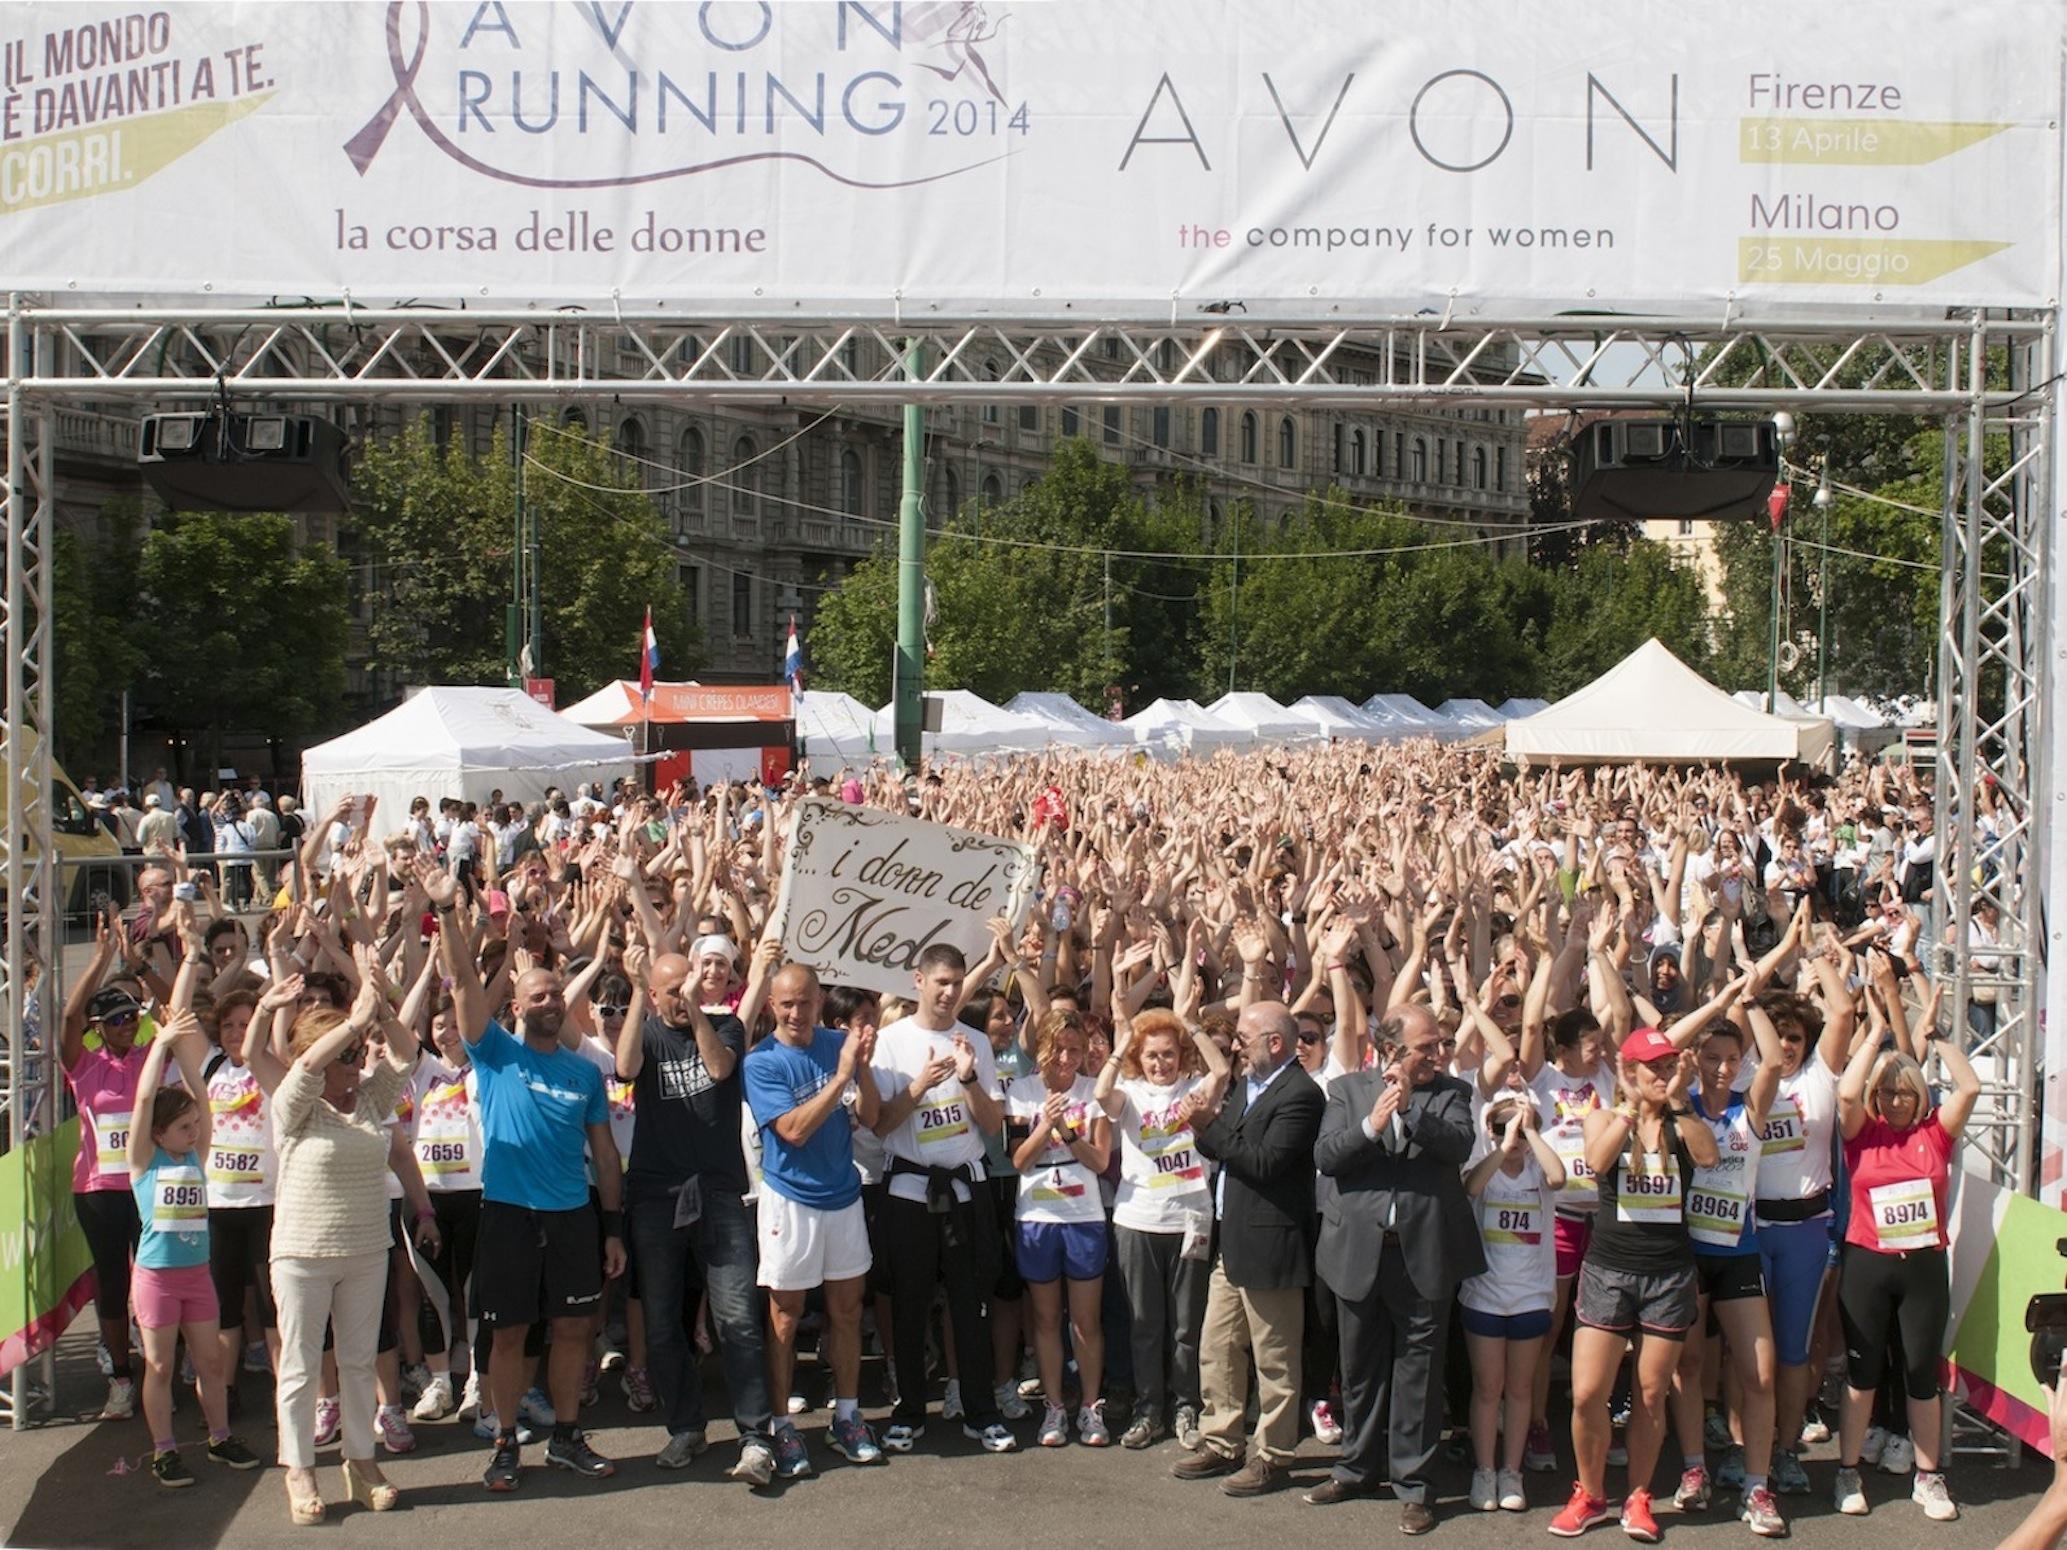 avon running Partenza 5 Km Milano 2014